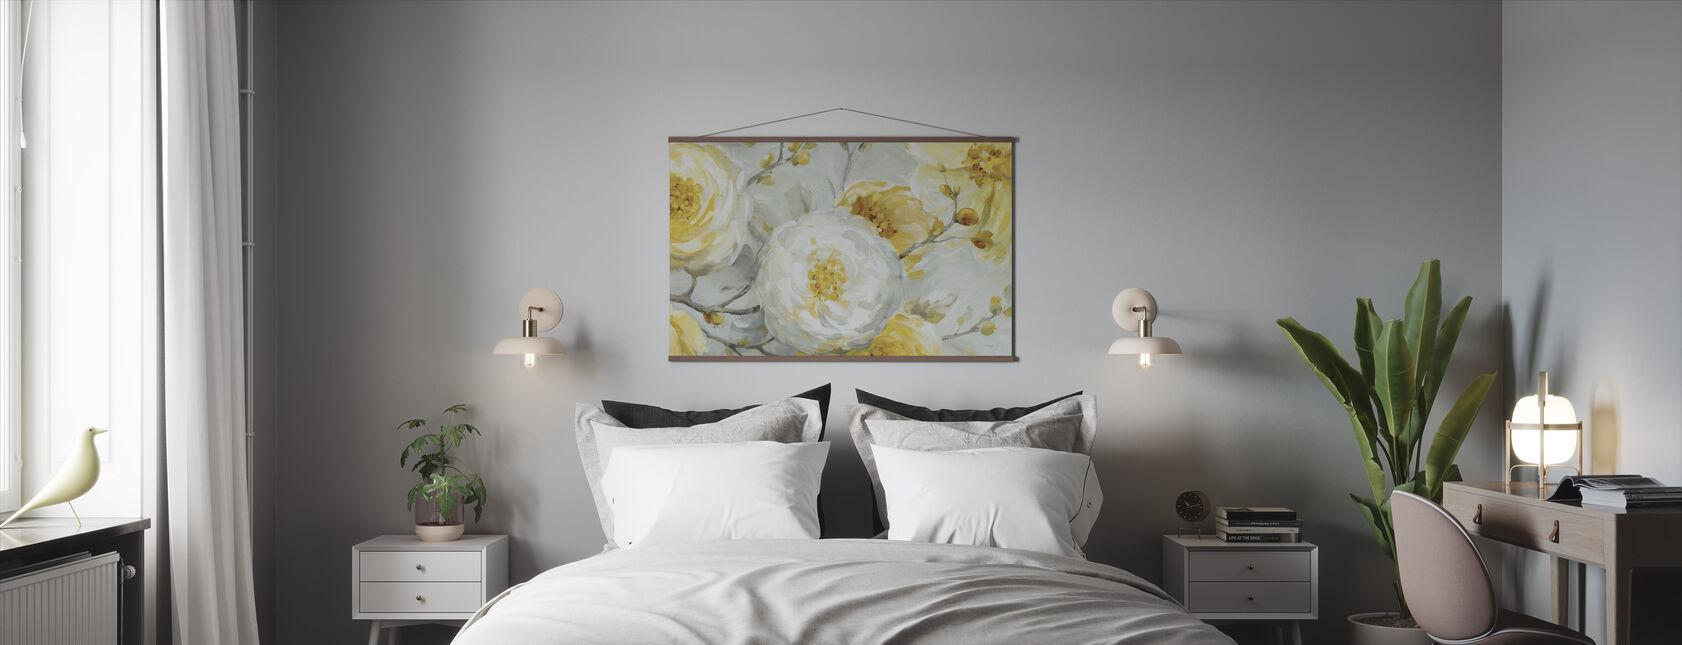 Sunshine - Poster - Bedroom